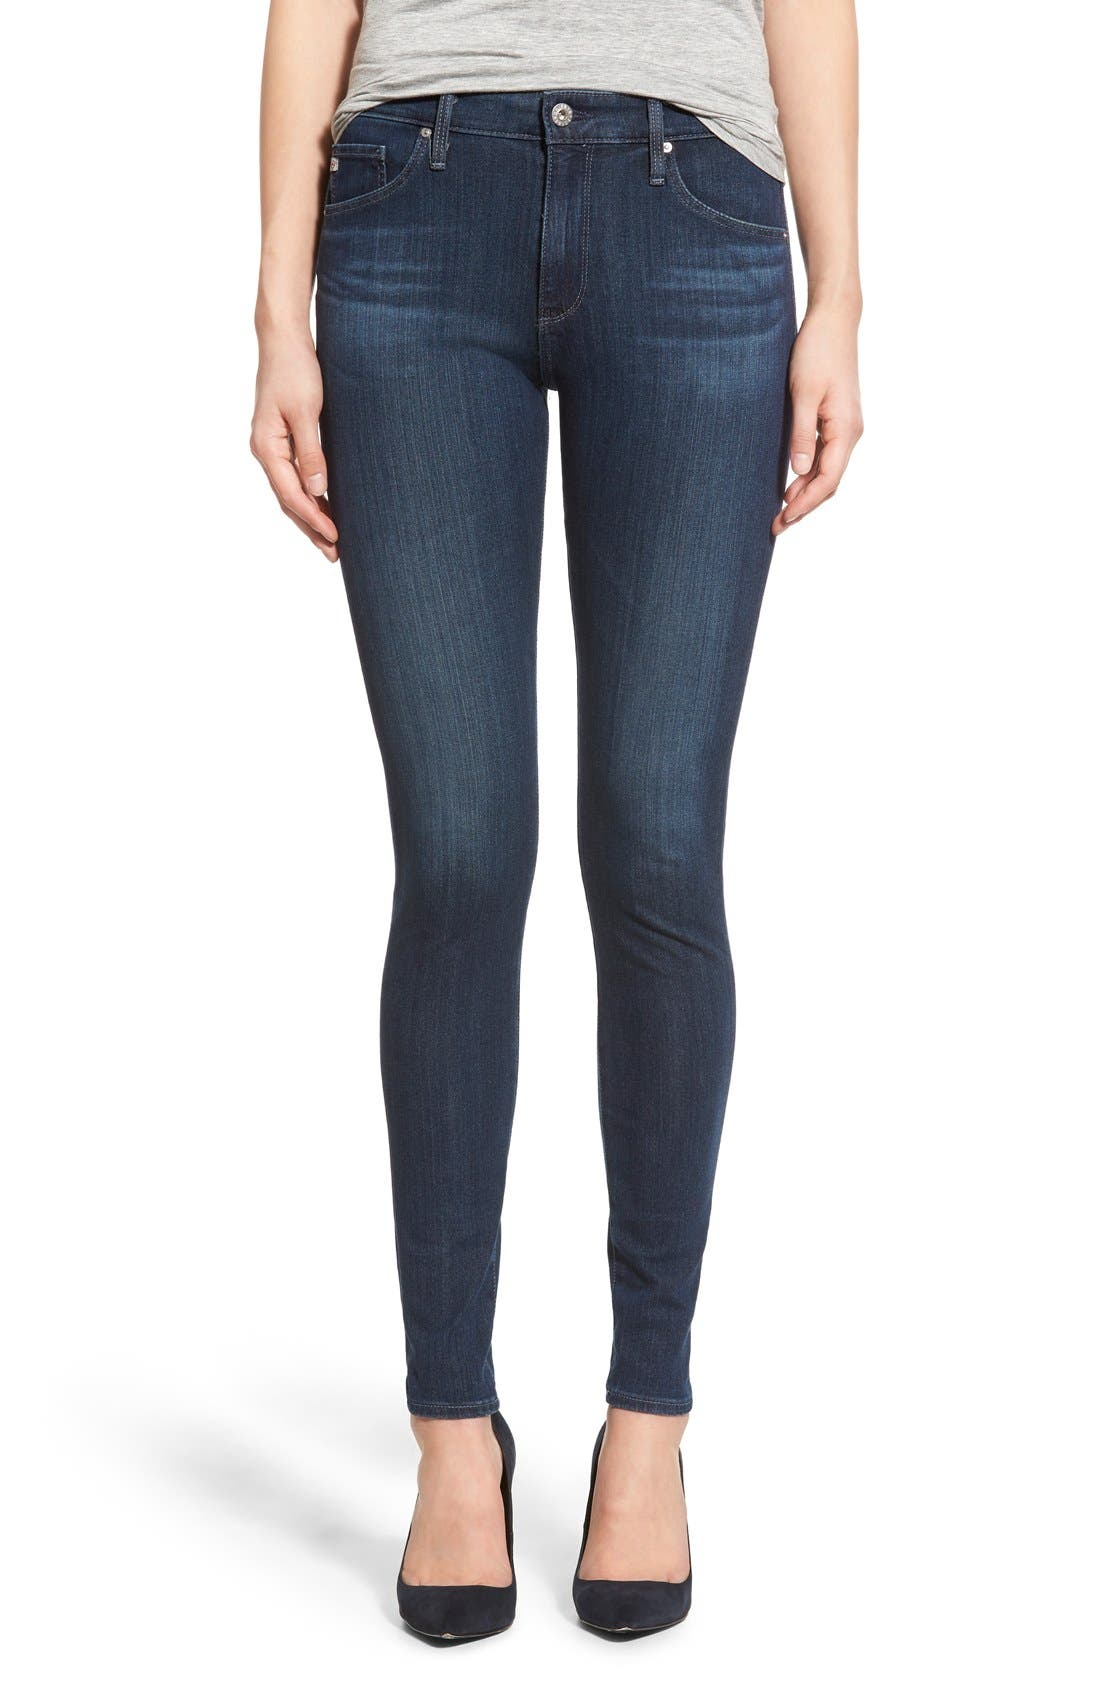 AG, 'The Farrah' High Rise Skinny Jeans, Main thumbnail 1, color, 402